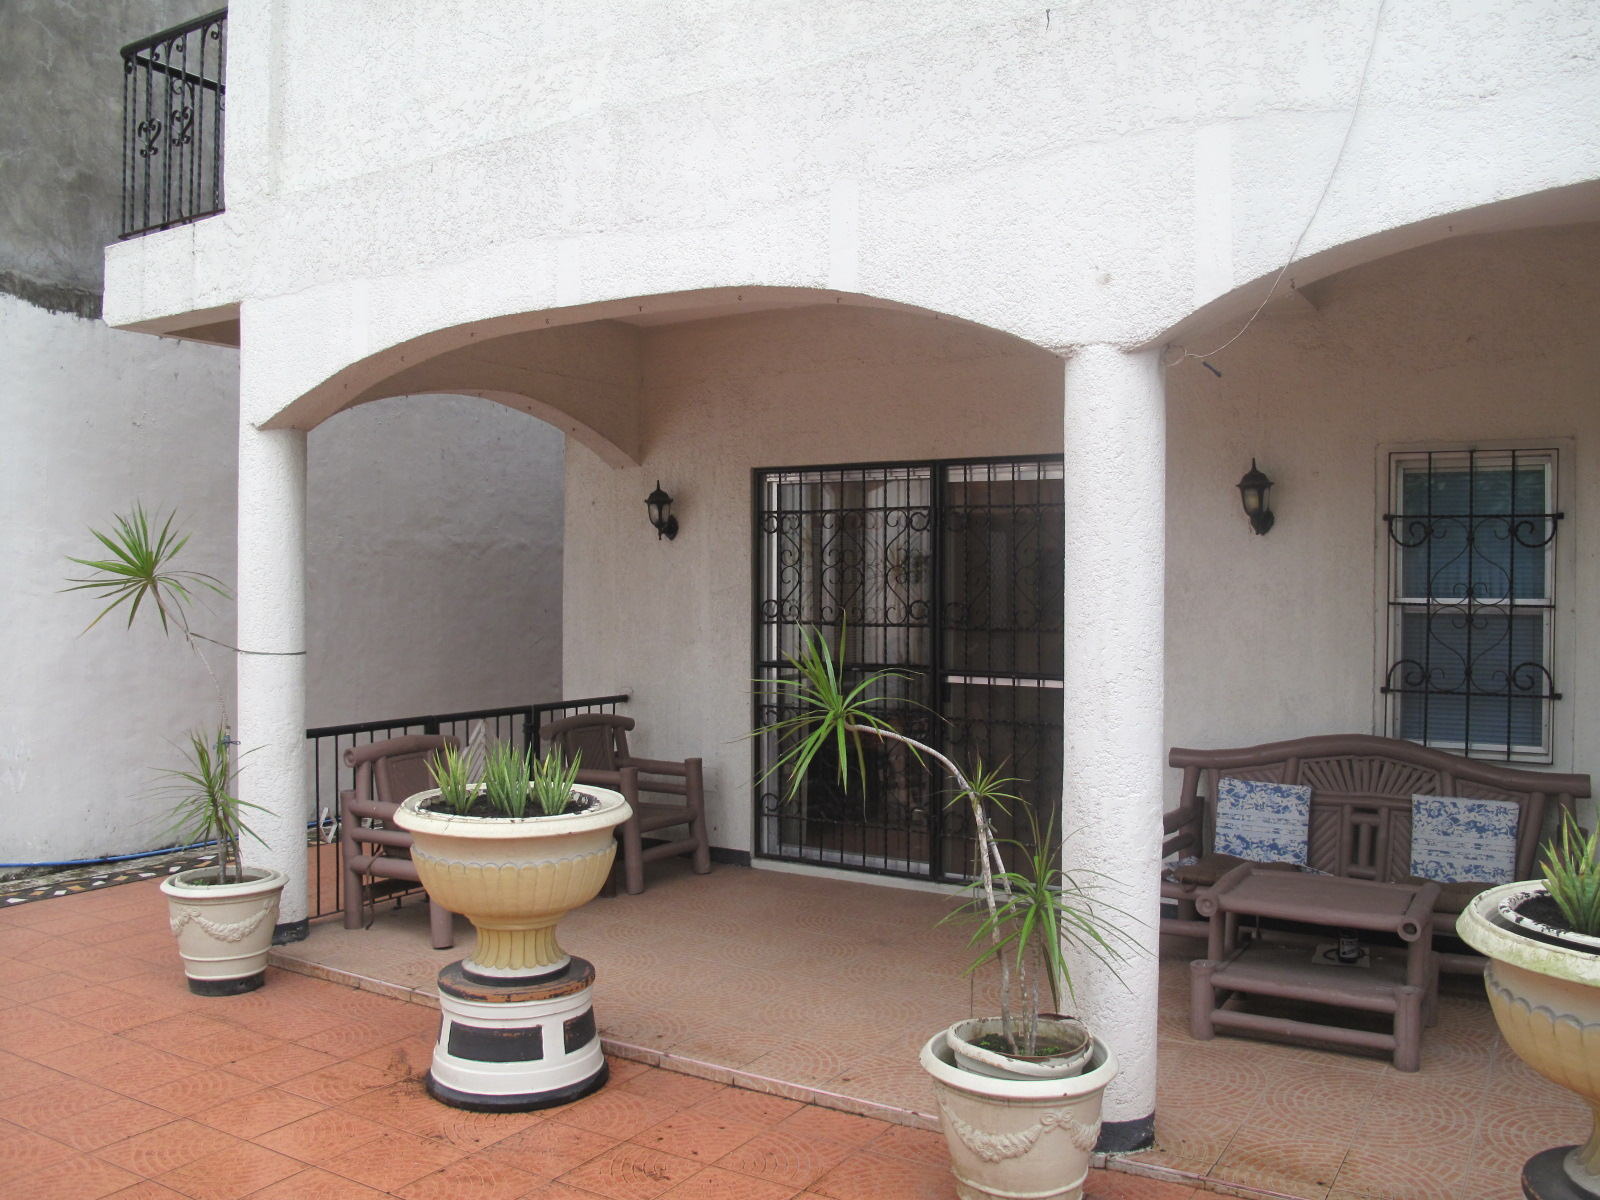 Elegant pili house lot for sale naga city real estate for Casa moderna naga city prices